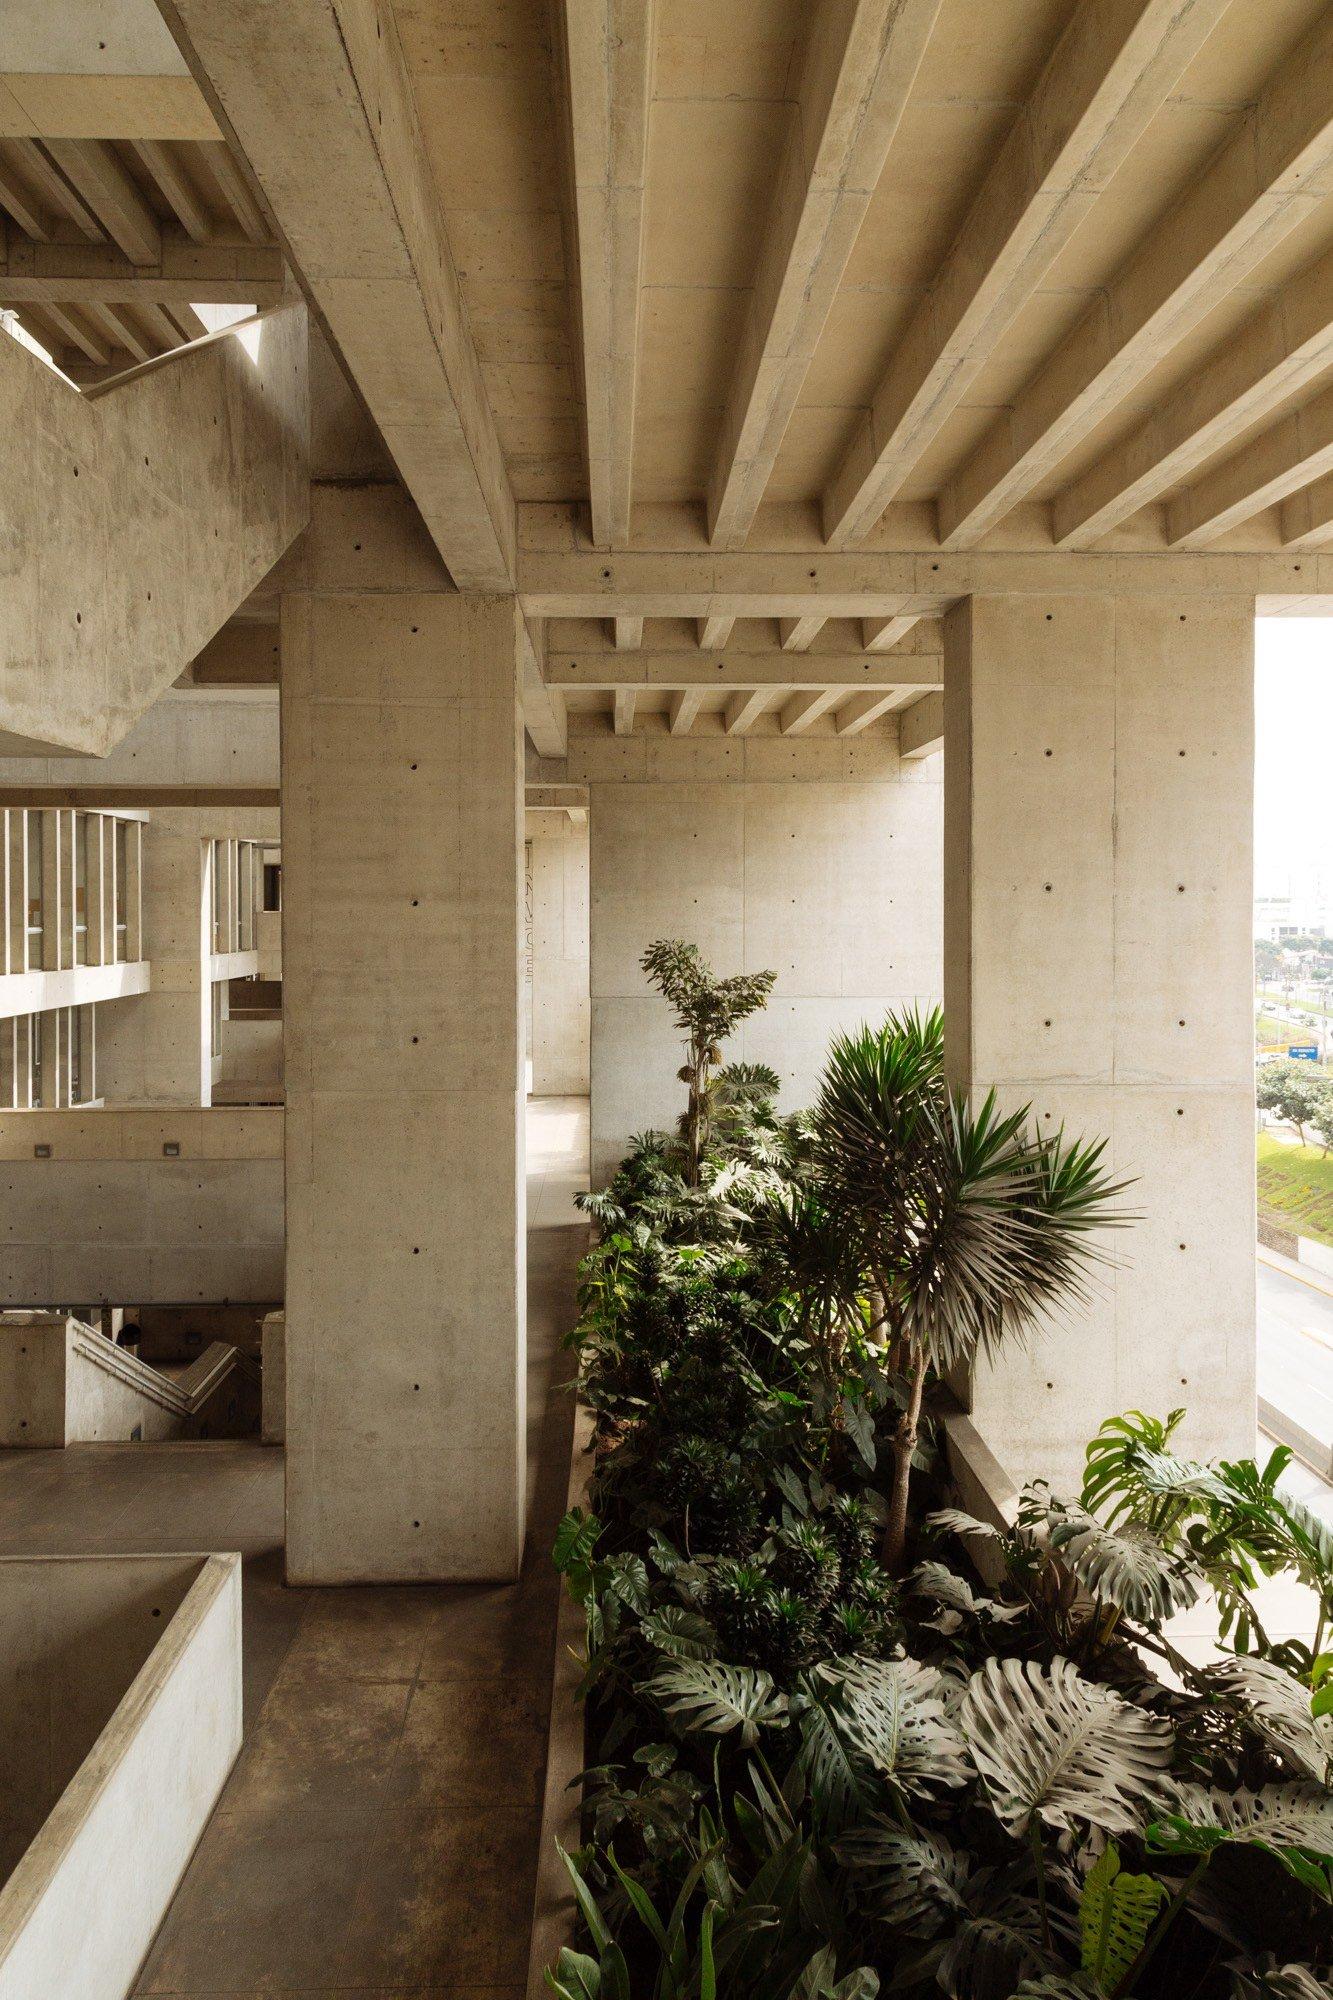 Arnau Rovira Vidal Photographs The Brutalist Architecture Of Lima's New...